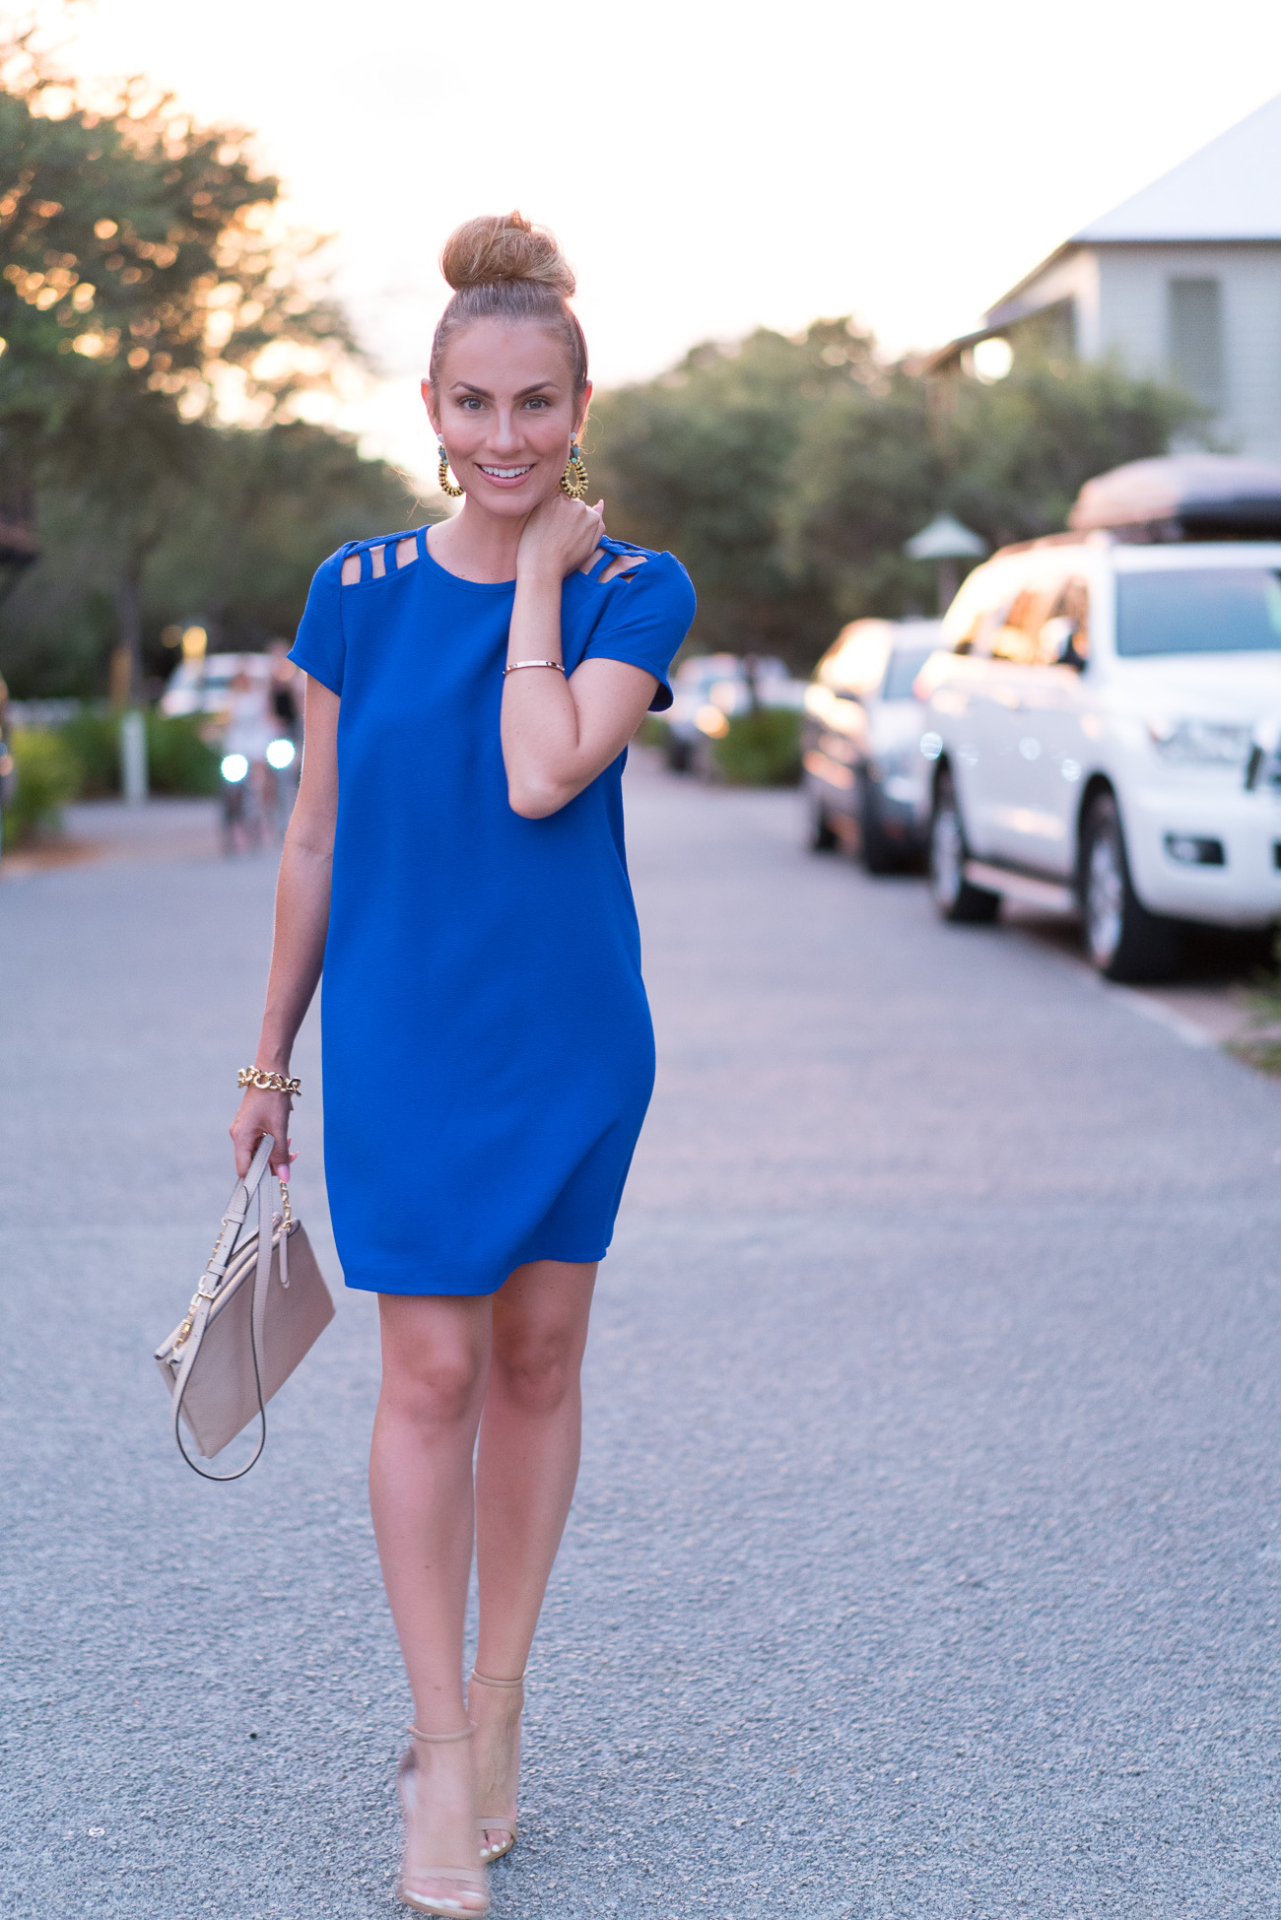 Cobalt blue nordstrom cut out dress angela lanter hello gorgeous rosemary beach florida 30A